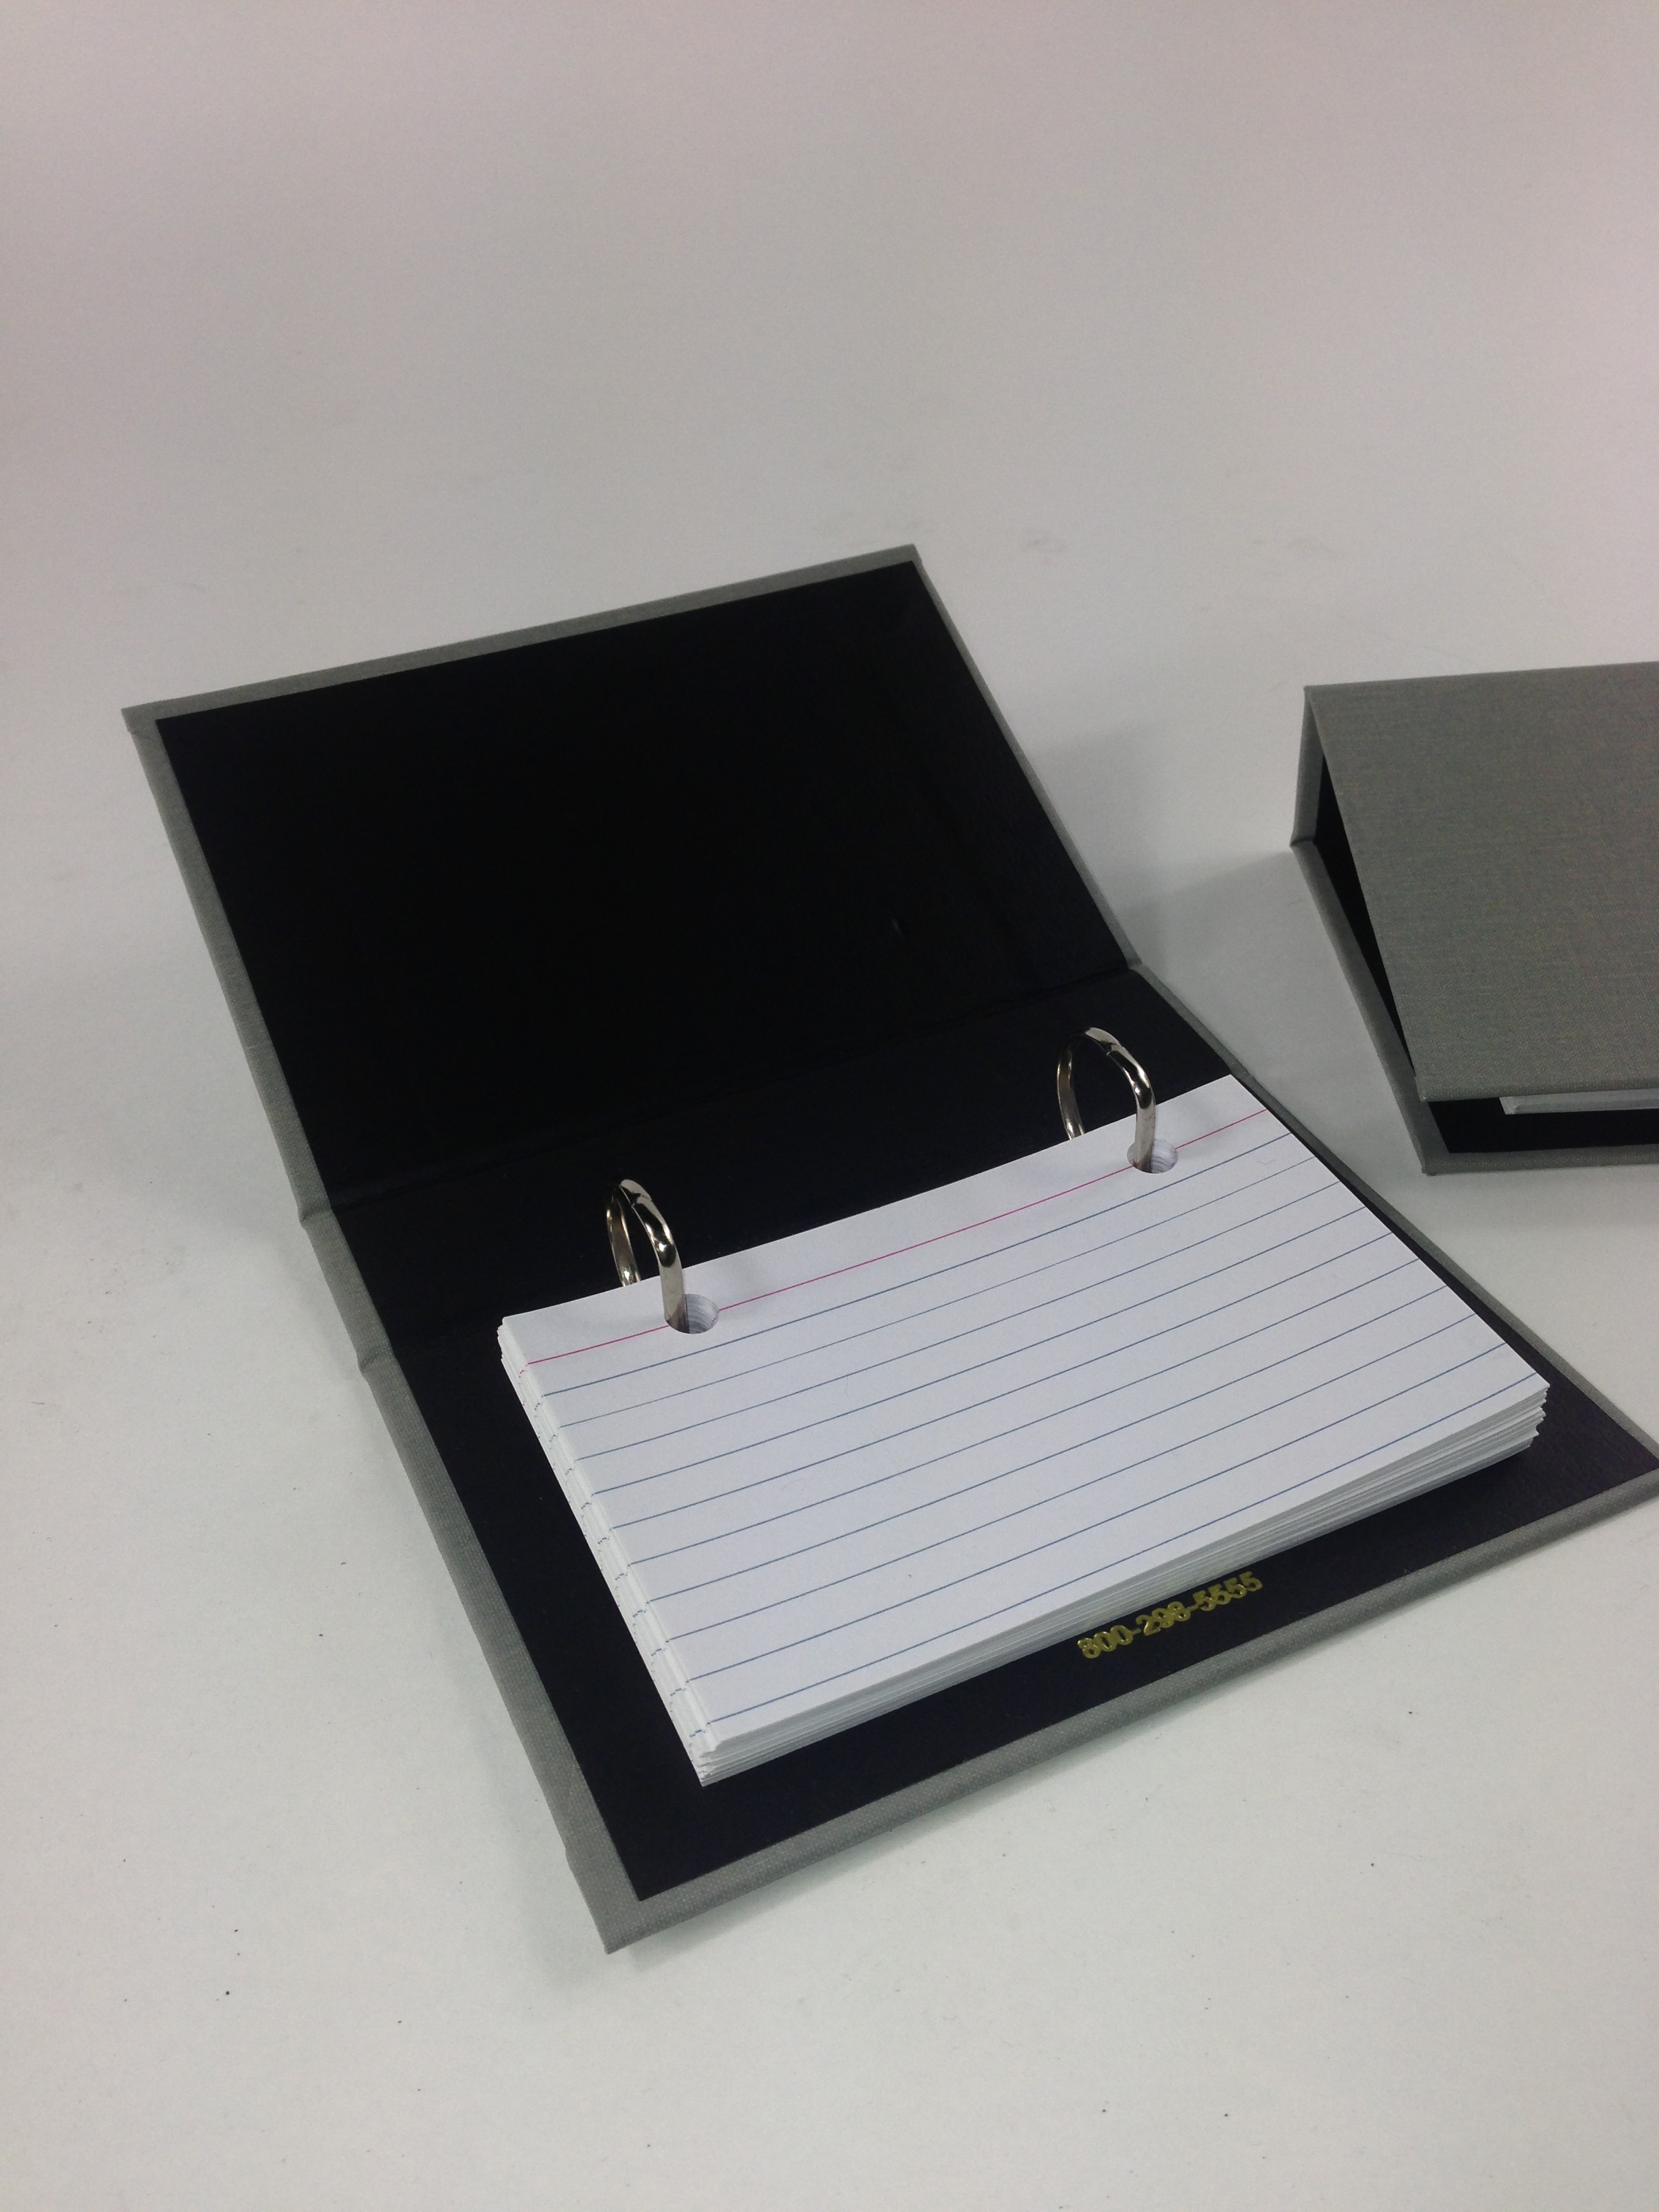 Index card binder 2 ring cloth binder 3x5 index card recipe index